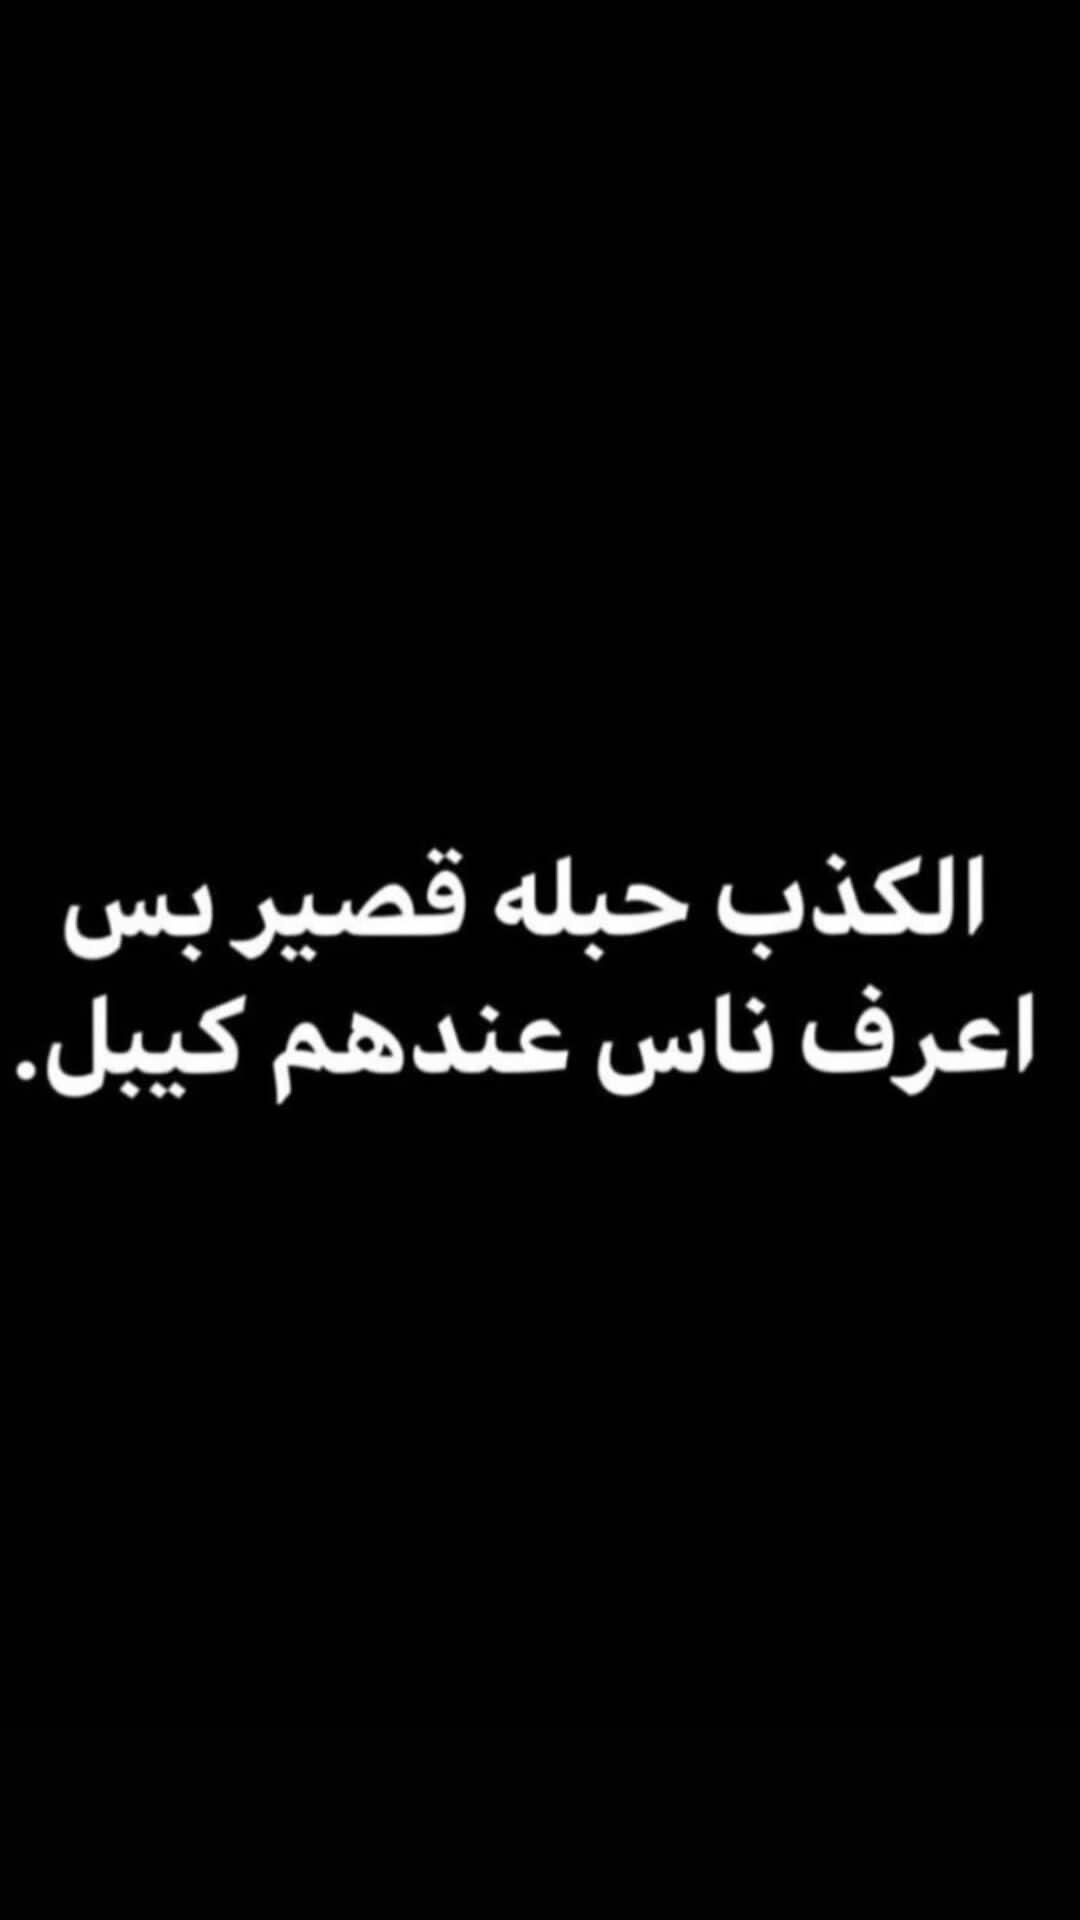 Pin By Shhvnr On Shaima Arabic Calligraphy Calligraphy